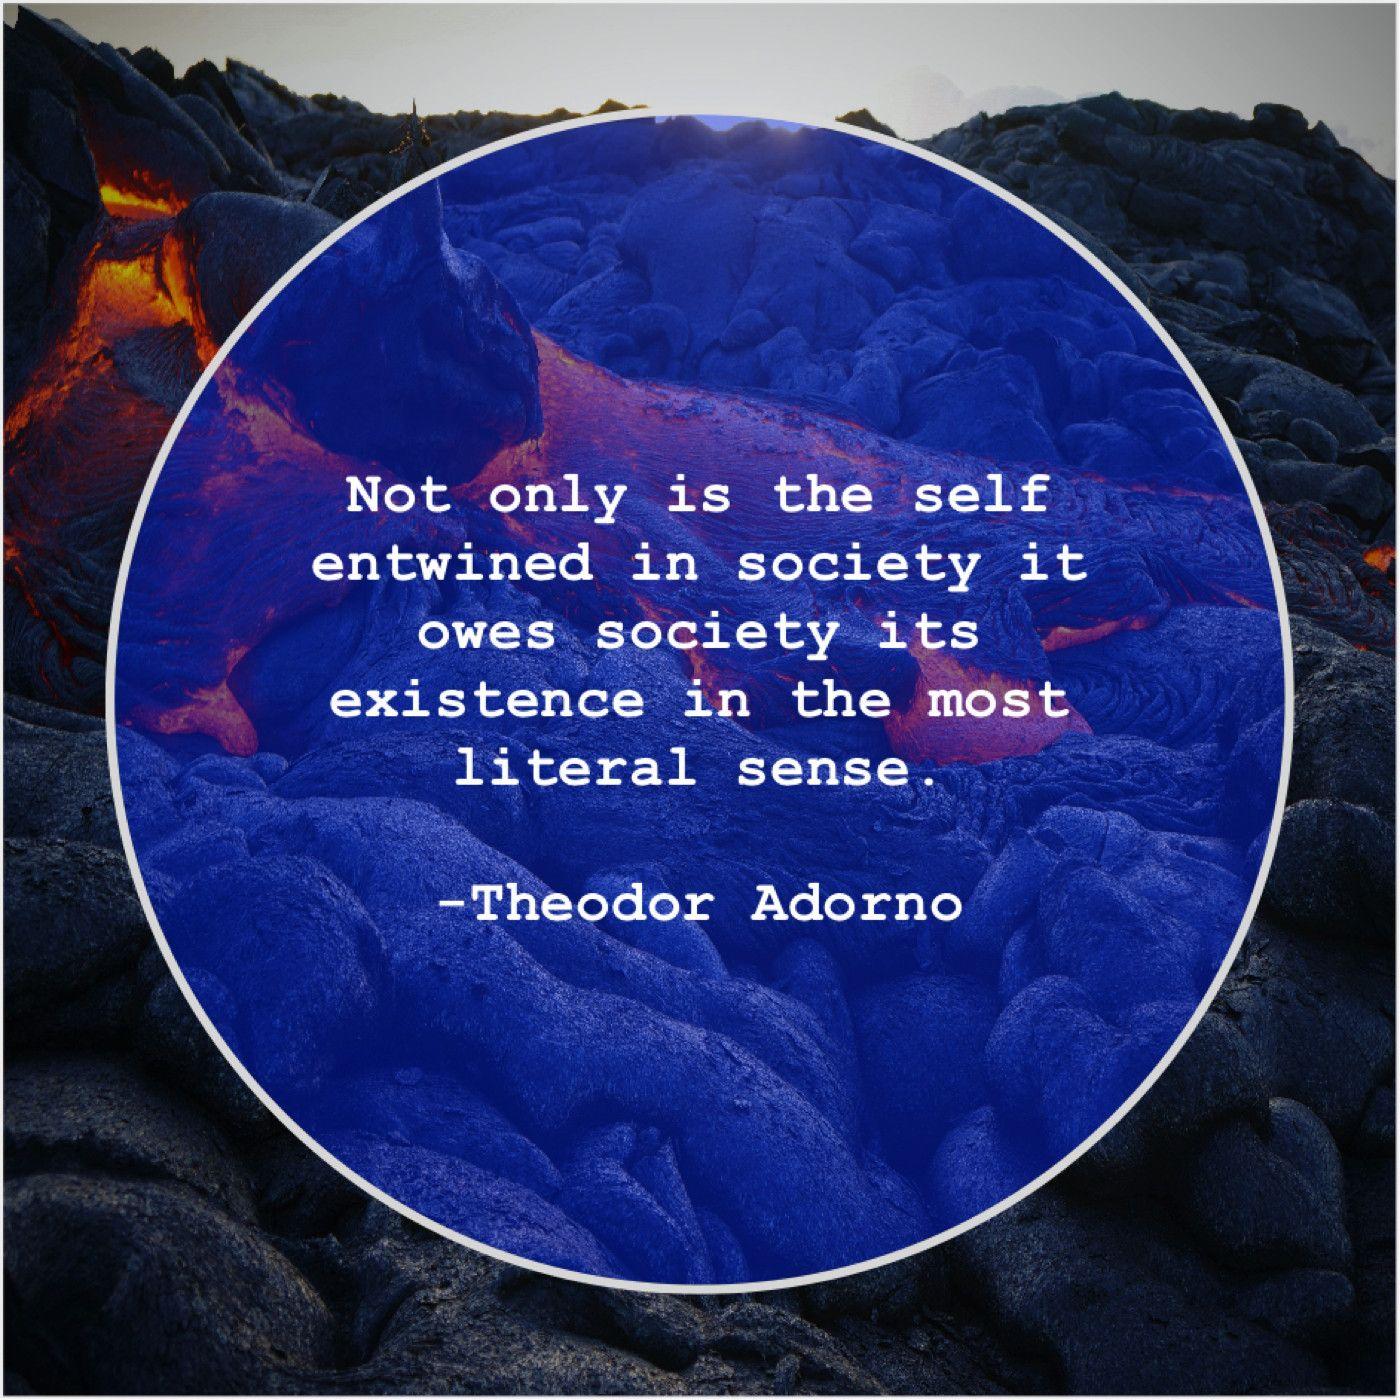 Theodor Adorno Not Only Is The Self Helen Keller Shawn Johnson Morgan Freeman